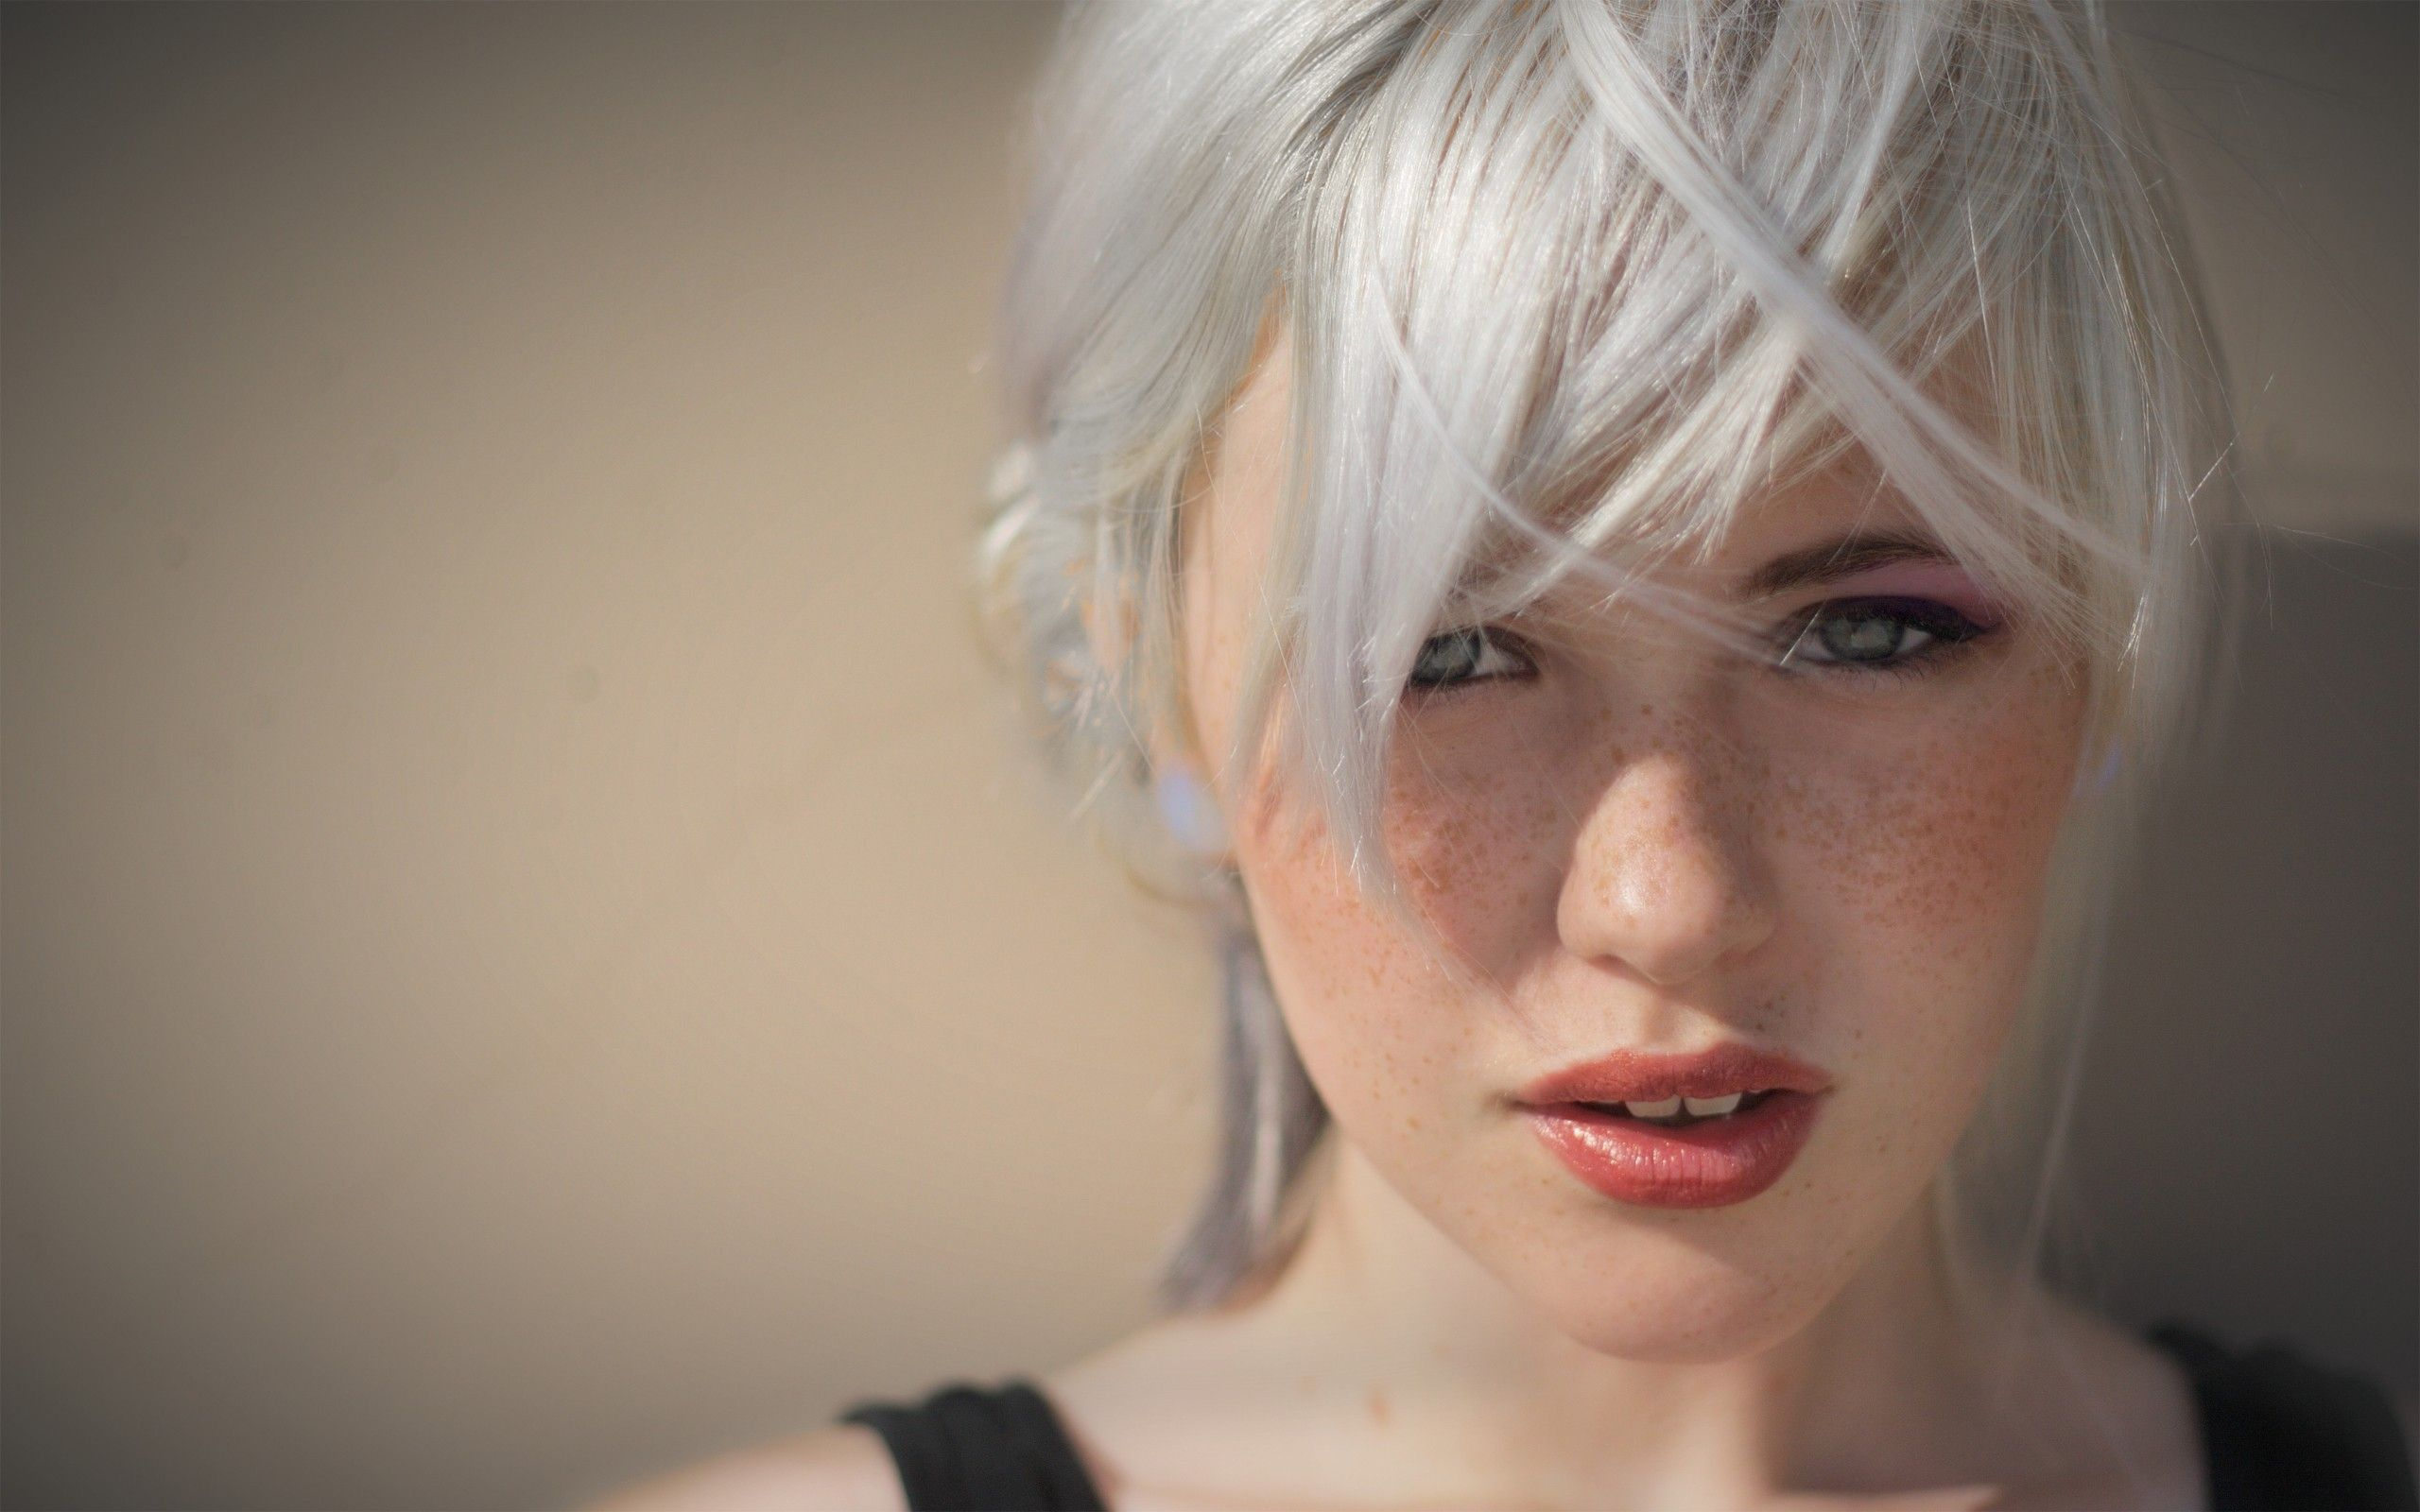 Coprire capelli bianchi senza tinta  62c1da97f926